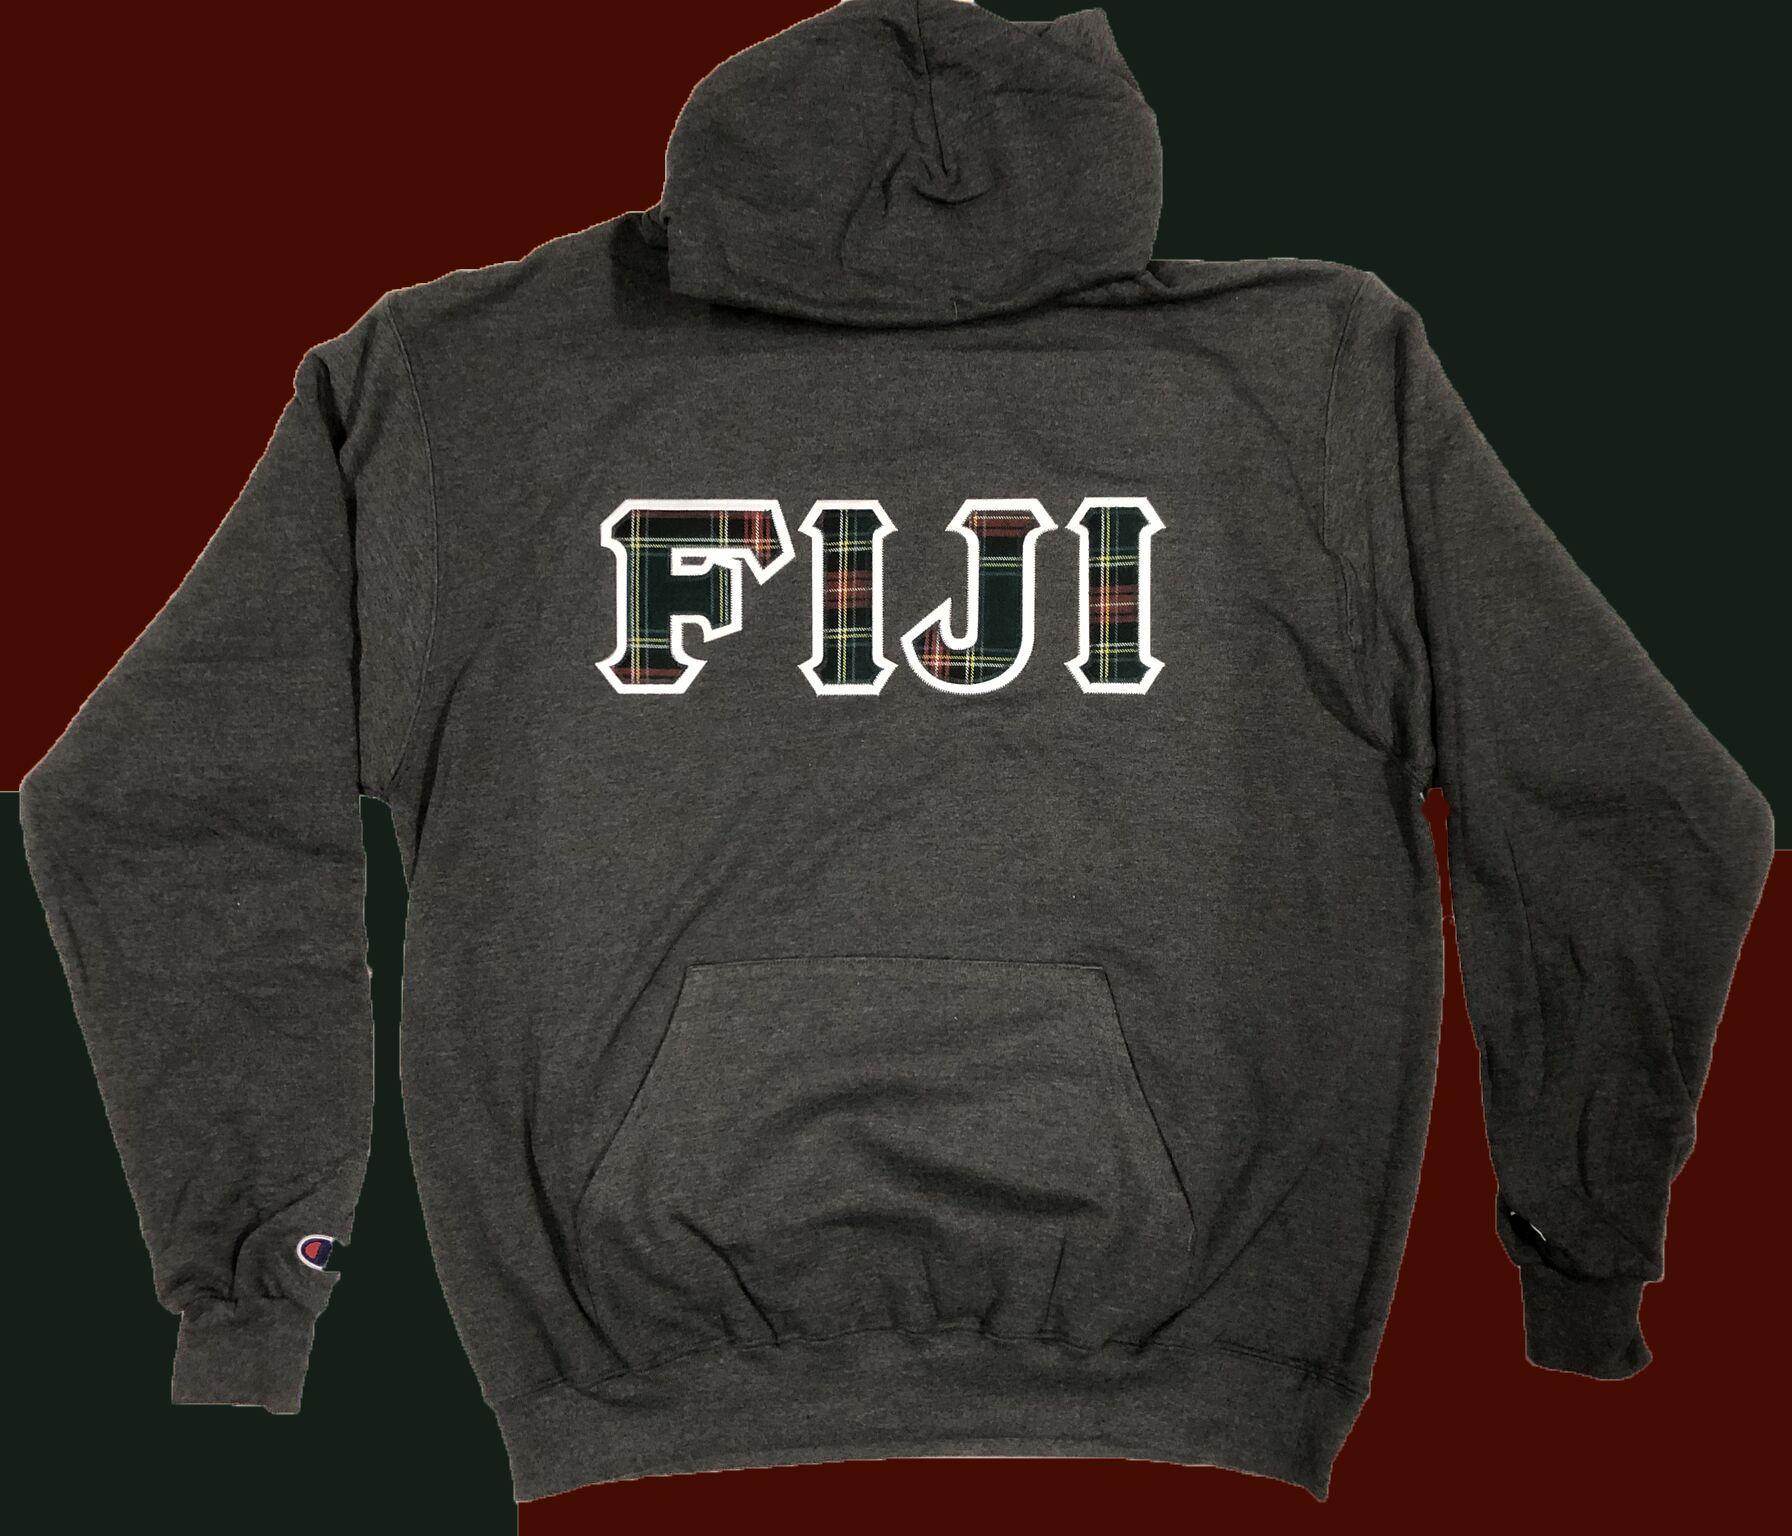 Custom Greek Sweatshirts Champion Fraternity Hoodie Add Your Stitch Letters Designergreek Champion Hooded Sweatshirt Sweatshirts Hooded Sweatshirts [ 1536 x 1792 Pixel ]